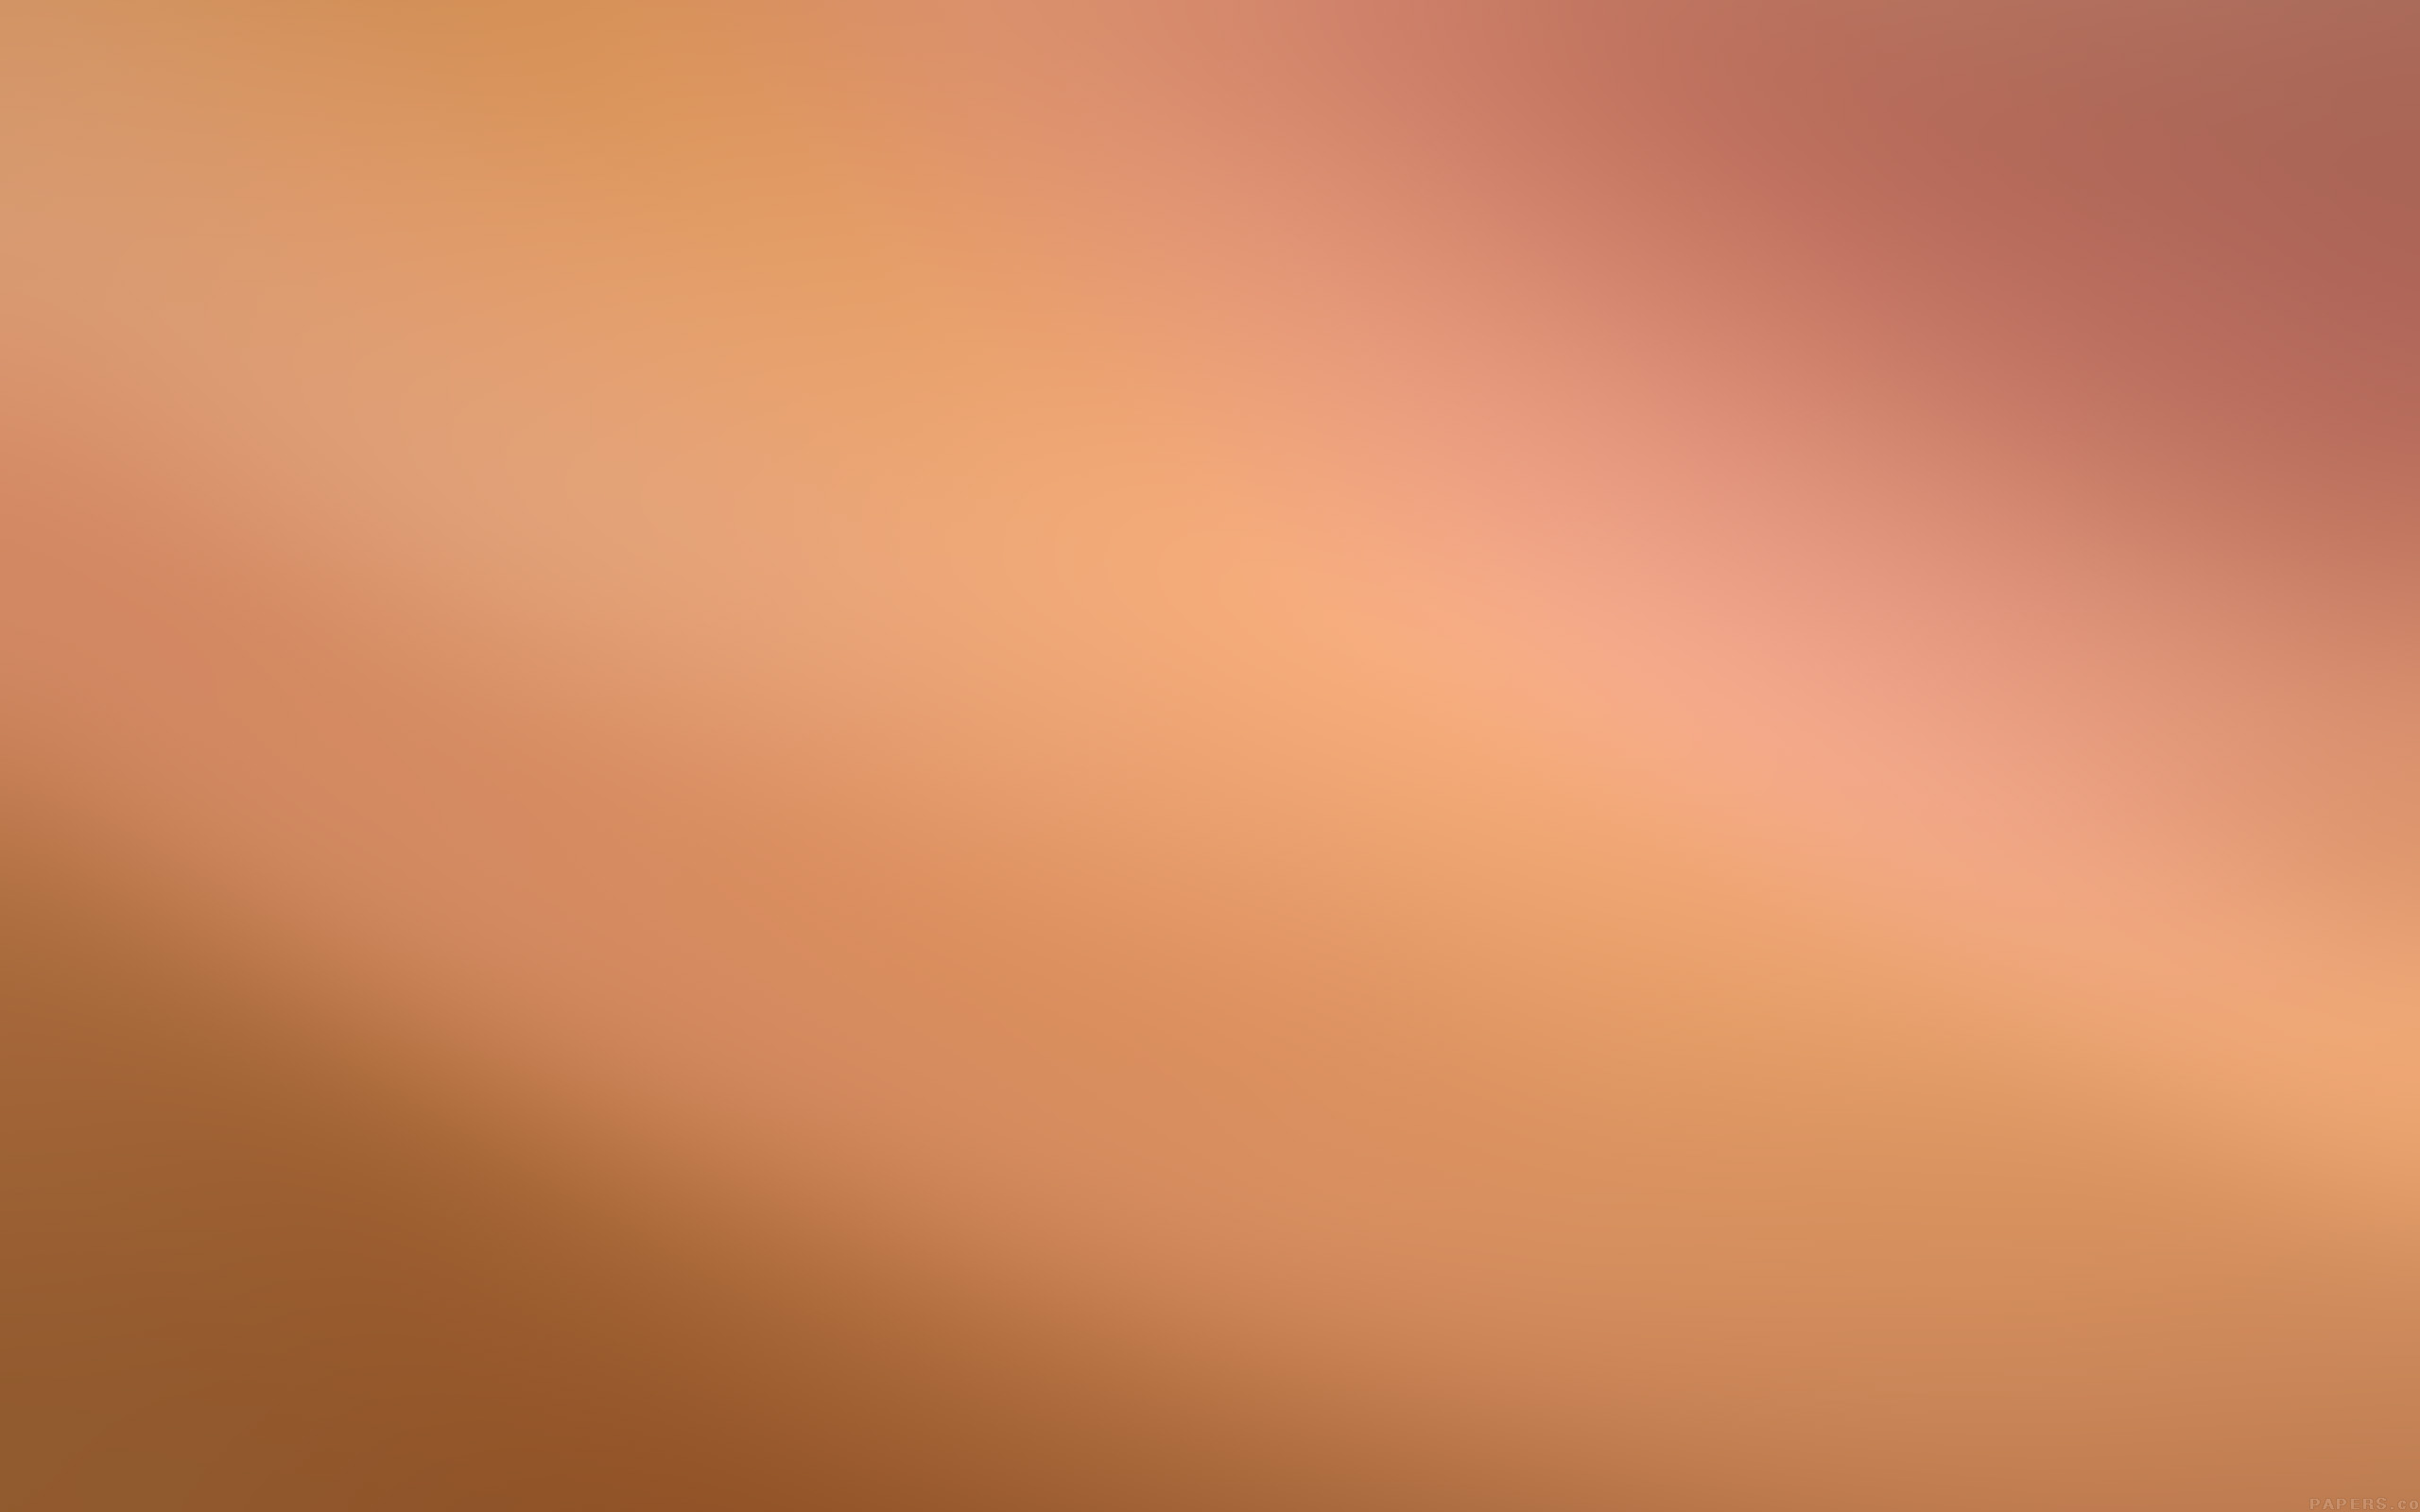 Cute Rain Hd Wallpapers Se93 Light Red Orange Love Gradation Blur Papers Co